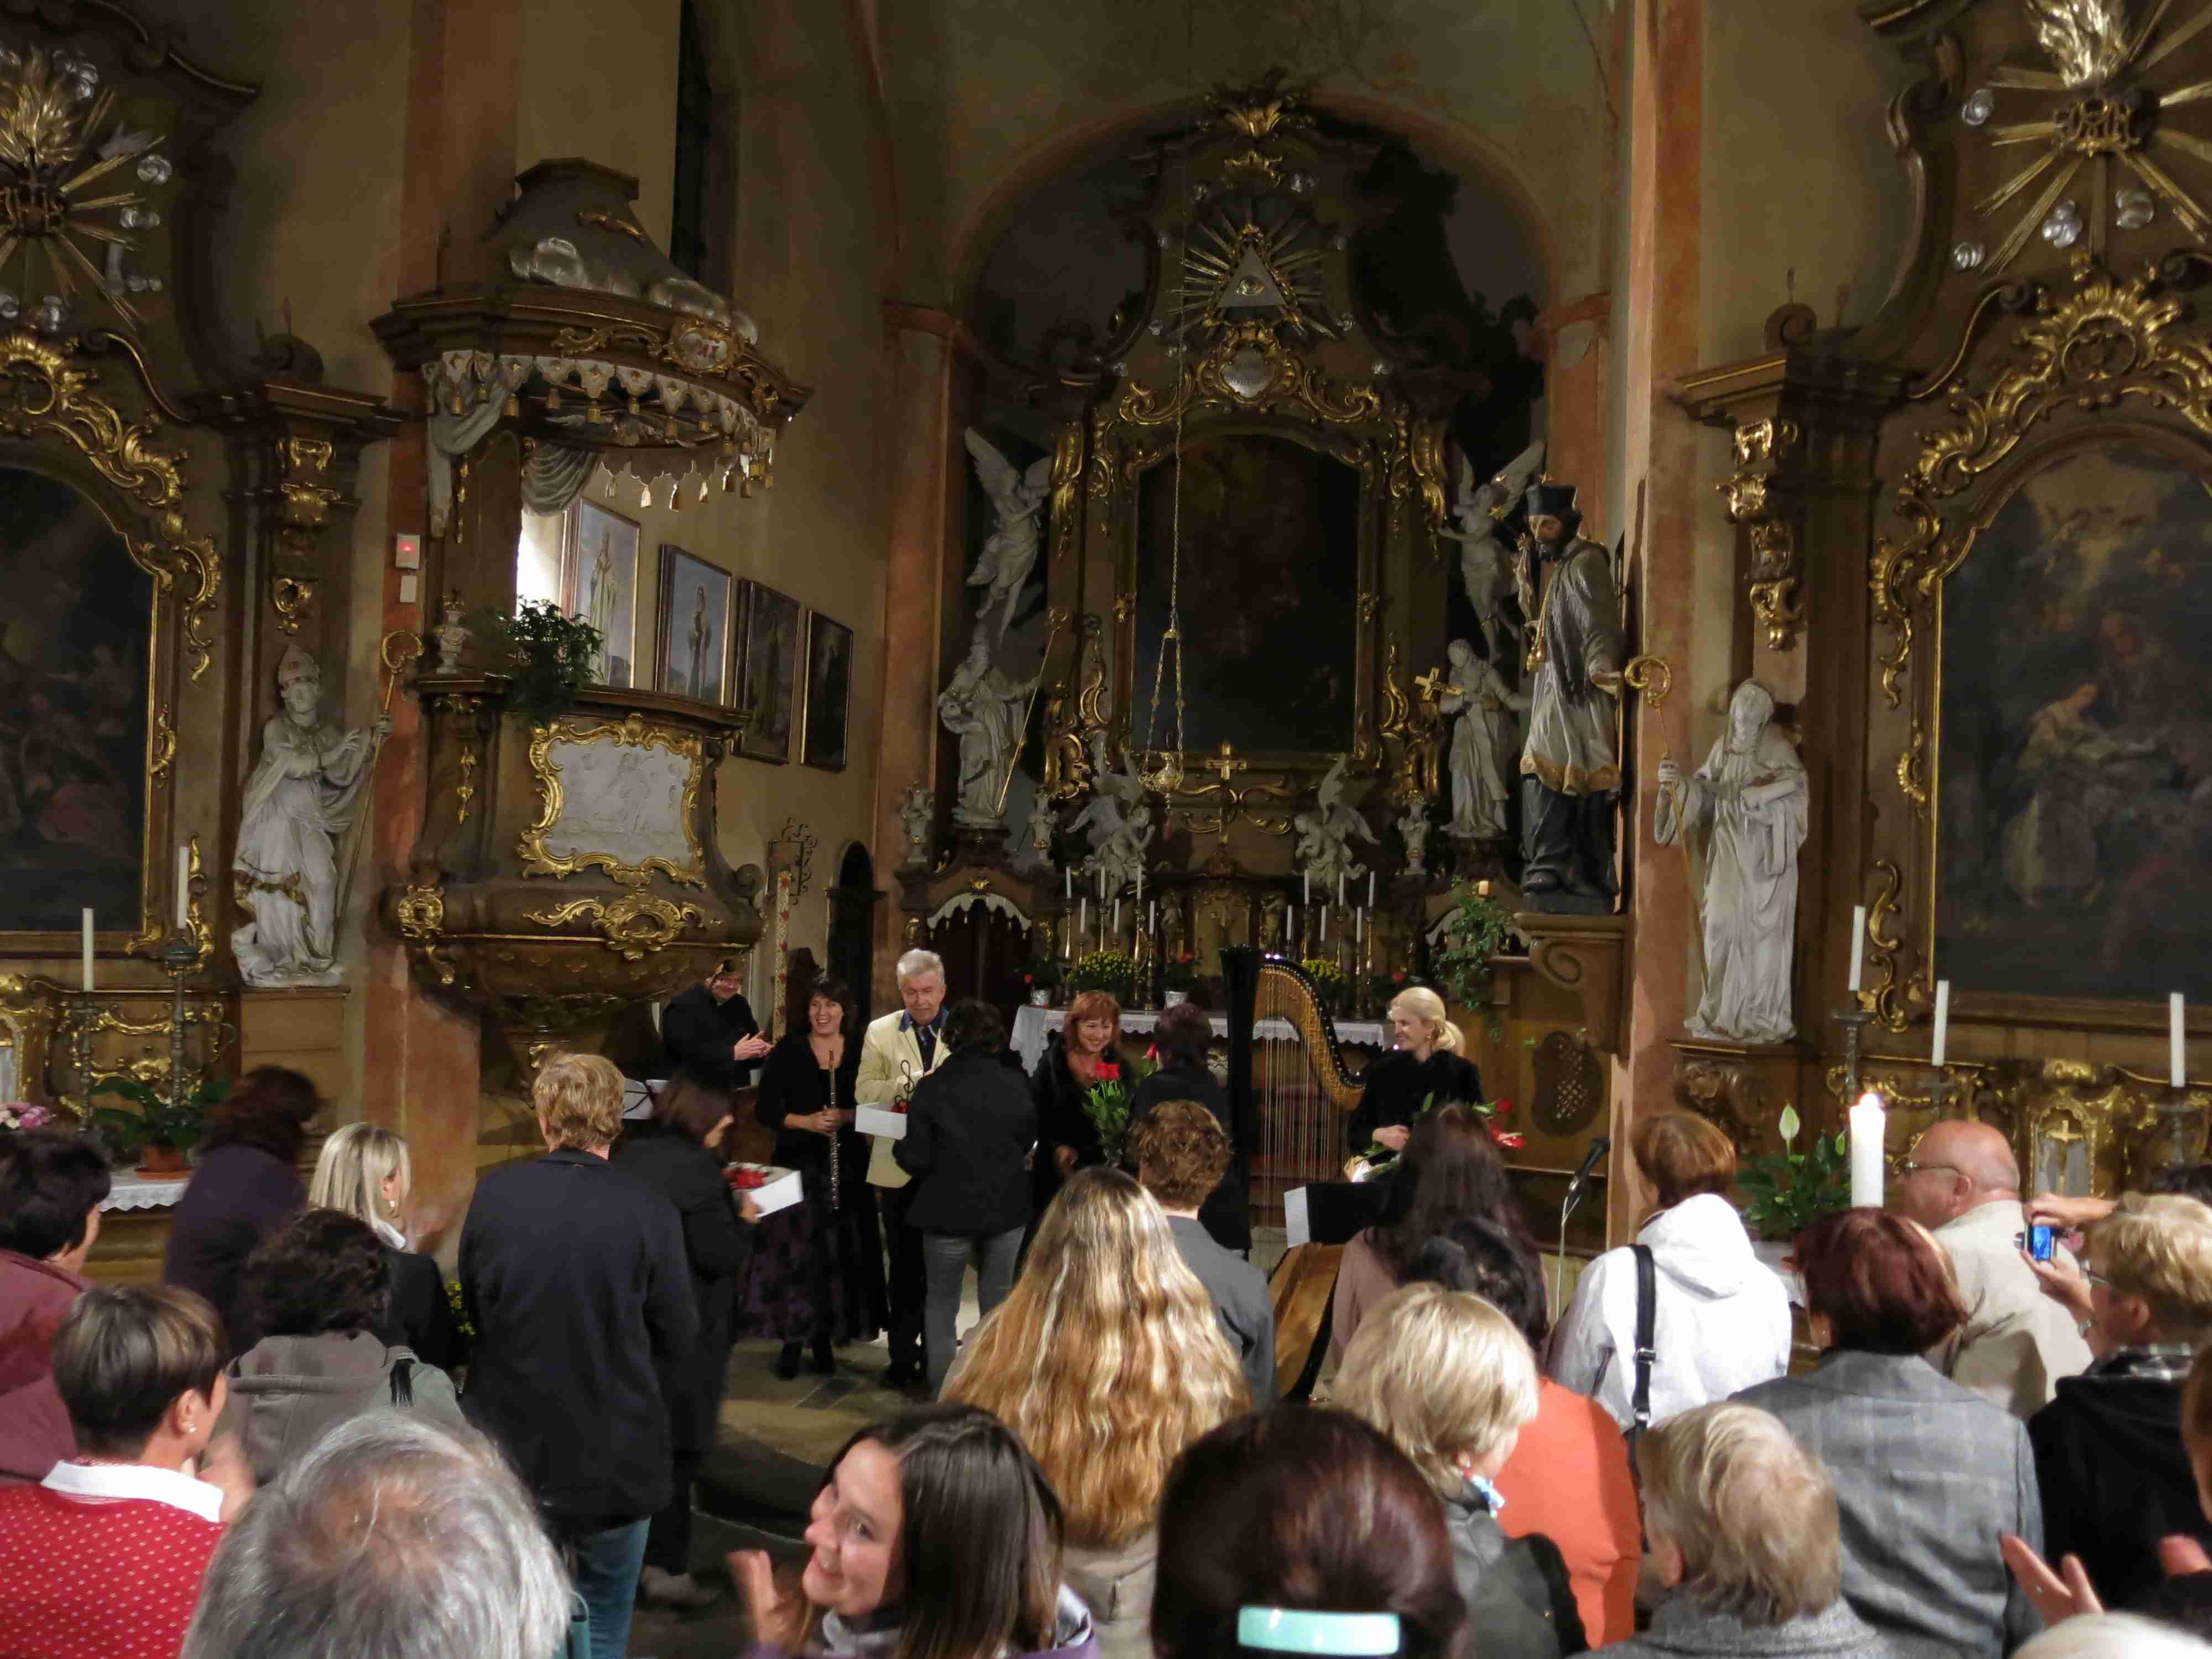 pouť ke sv. Františku 2014 - koncert - 3